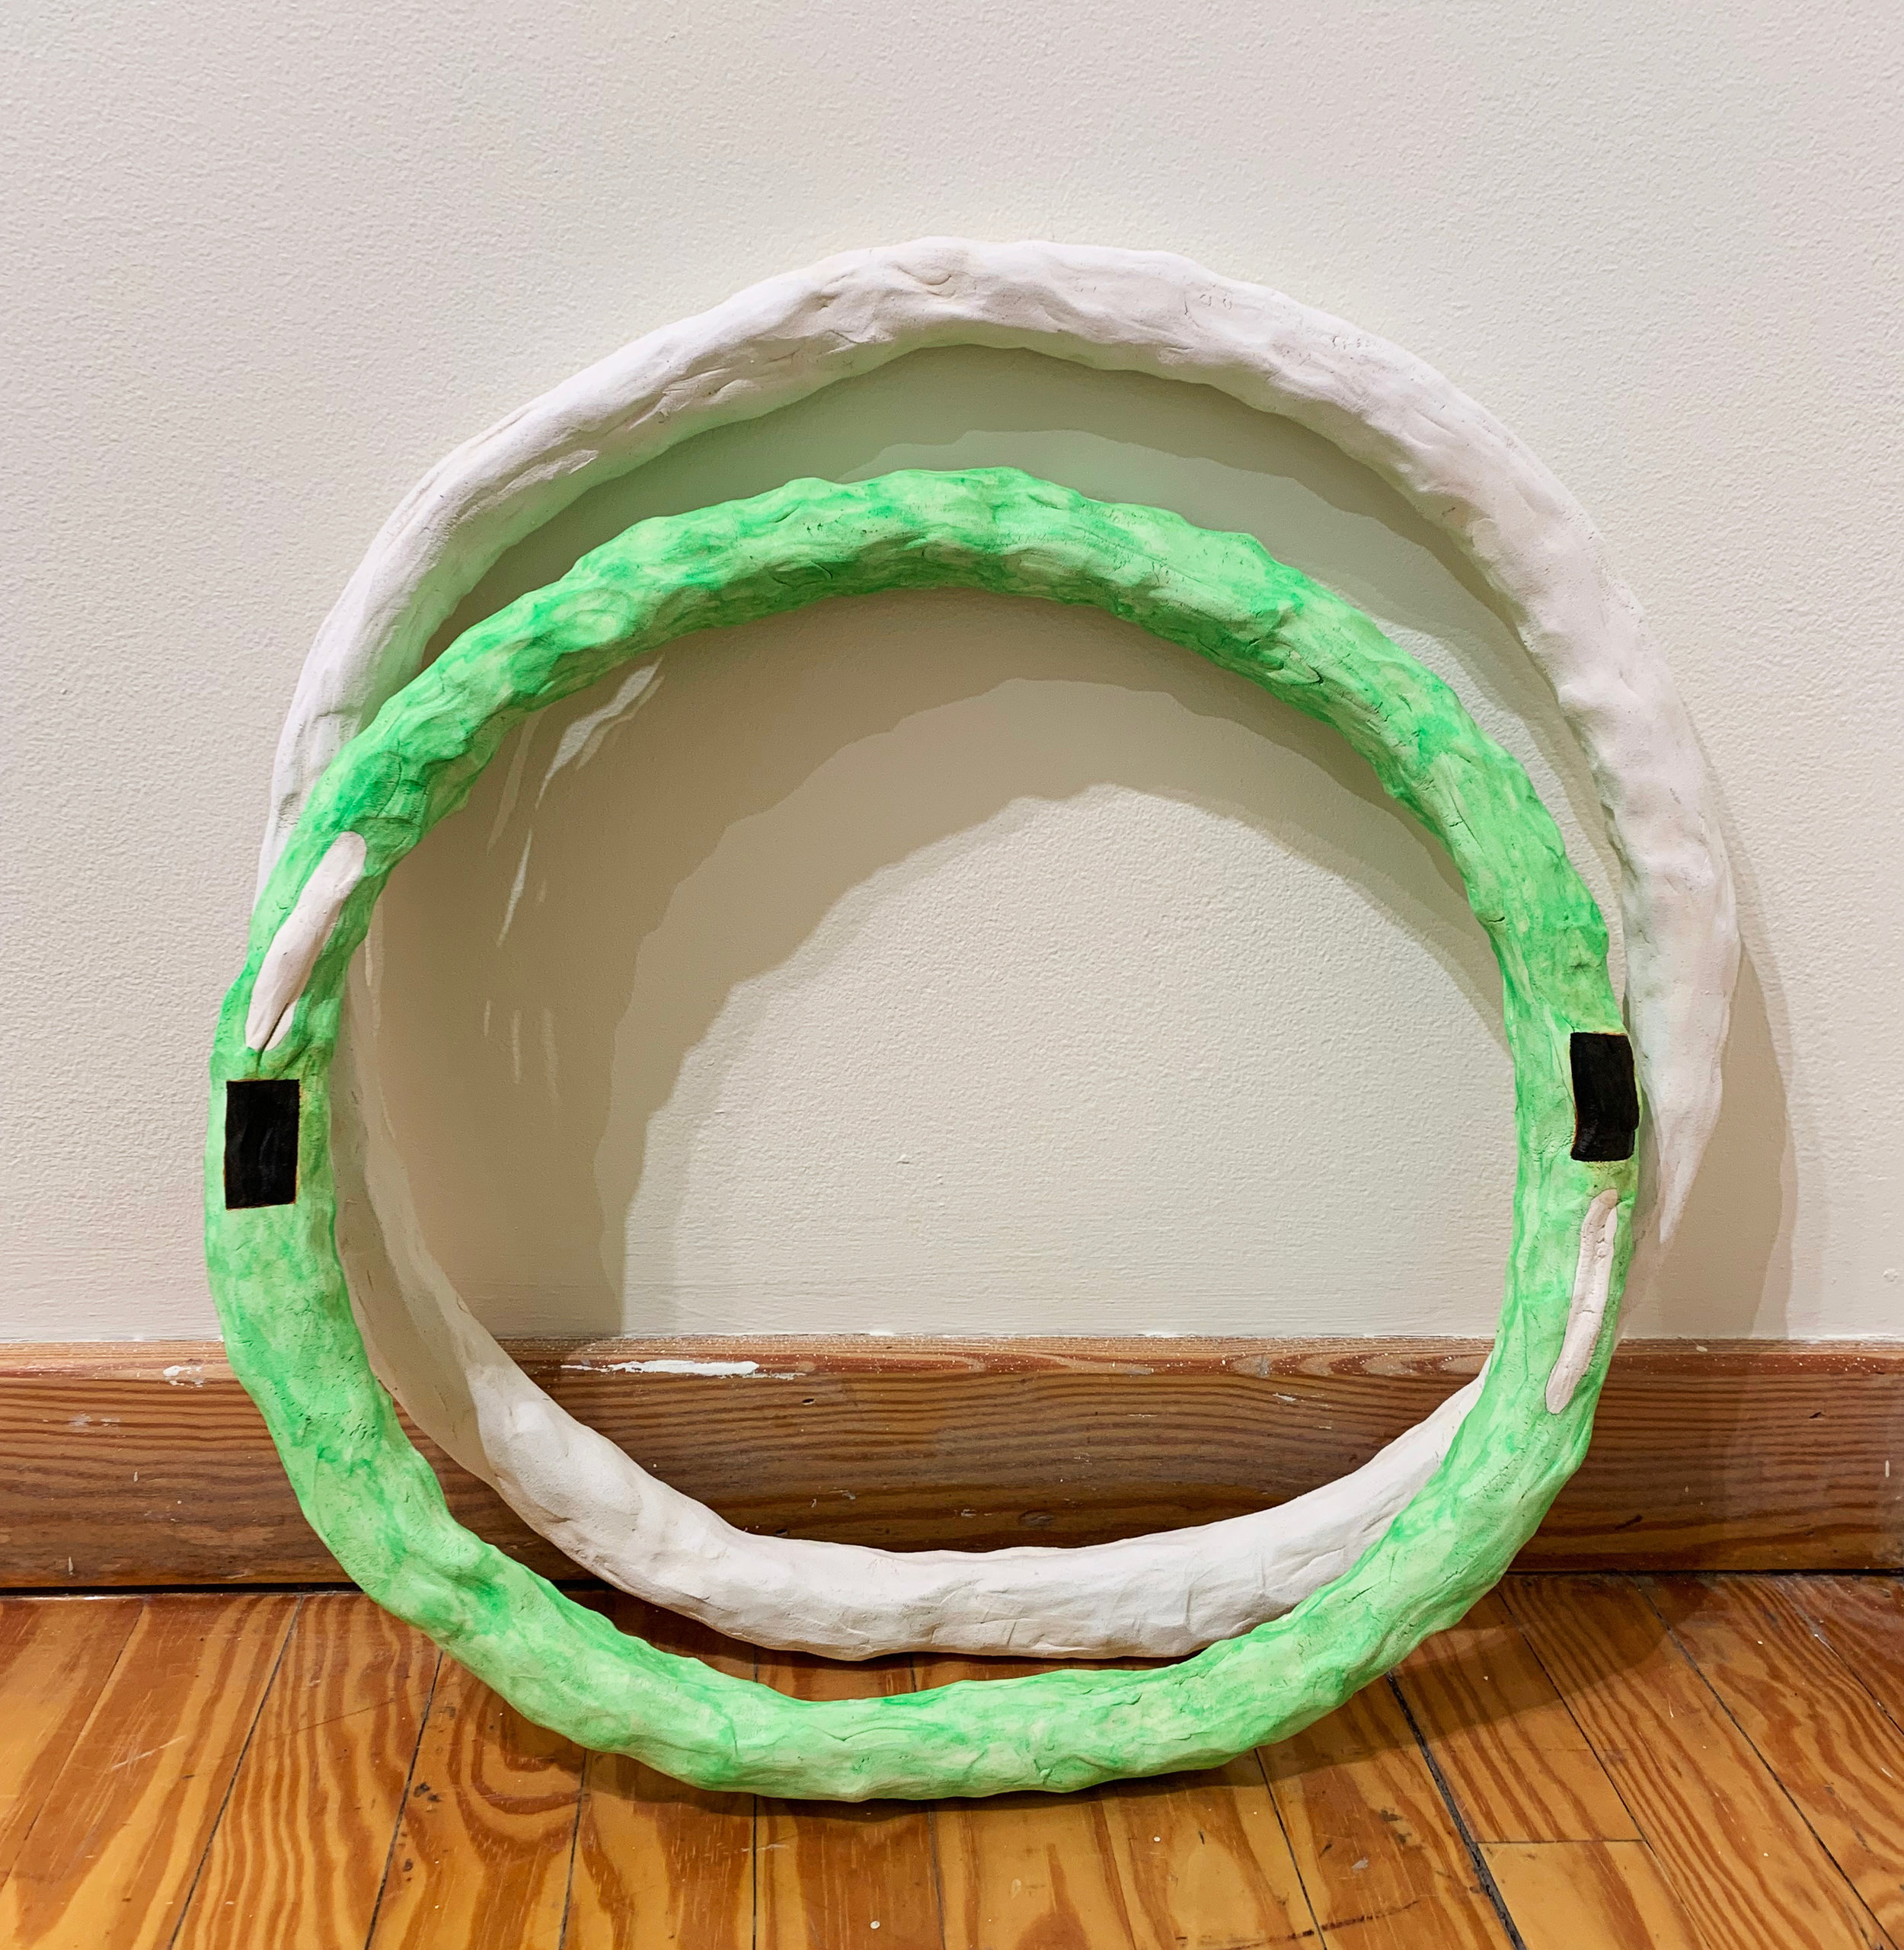 Untitled, 2019, earthenware